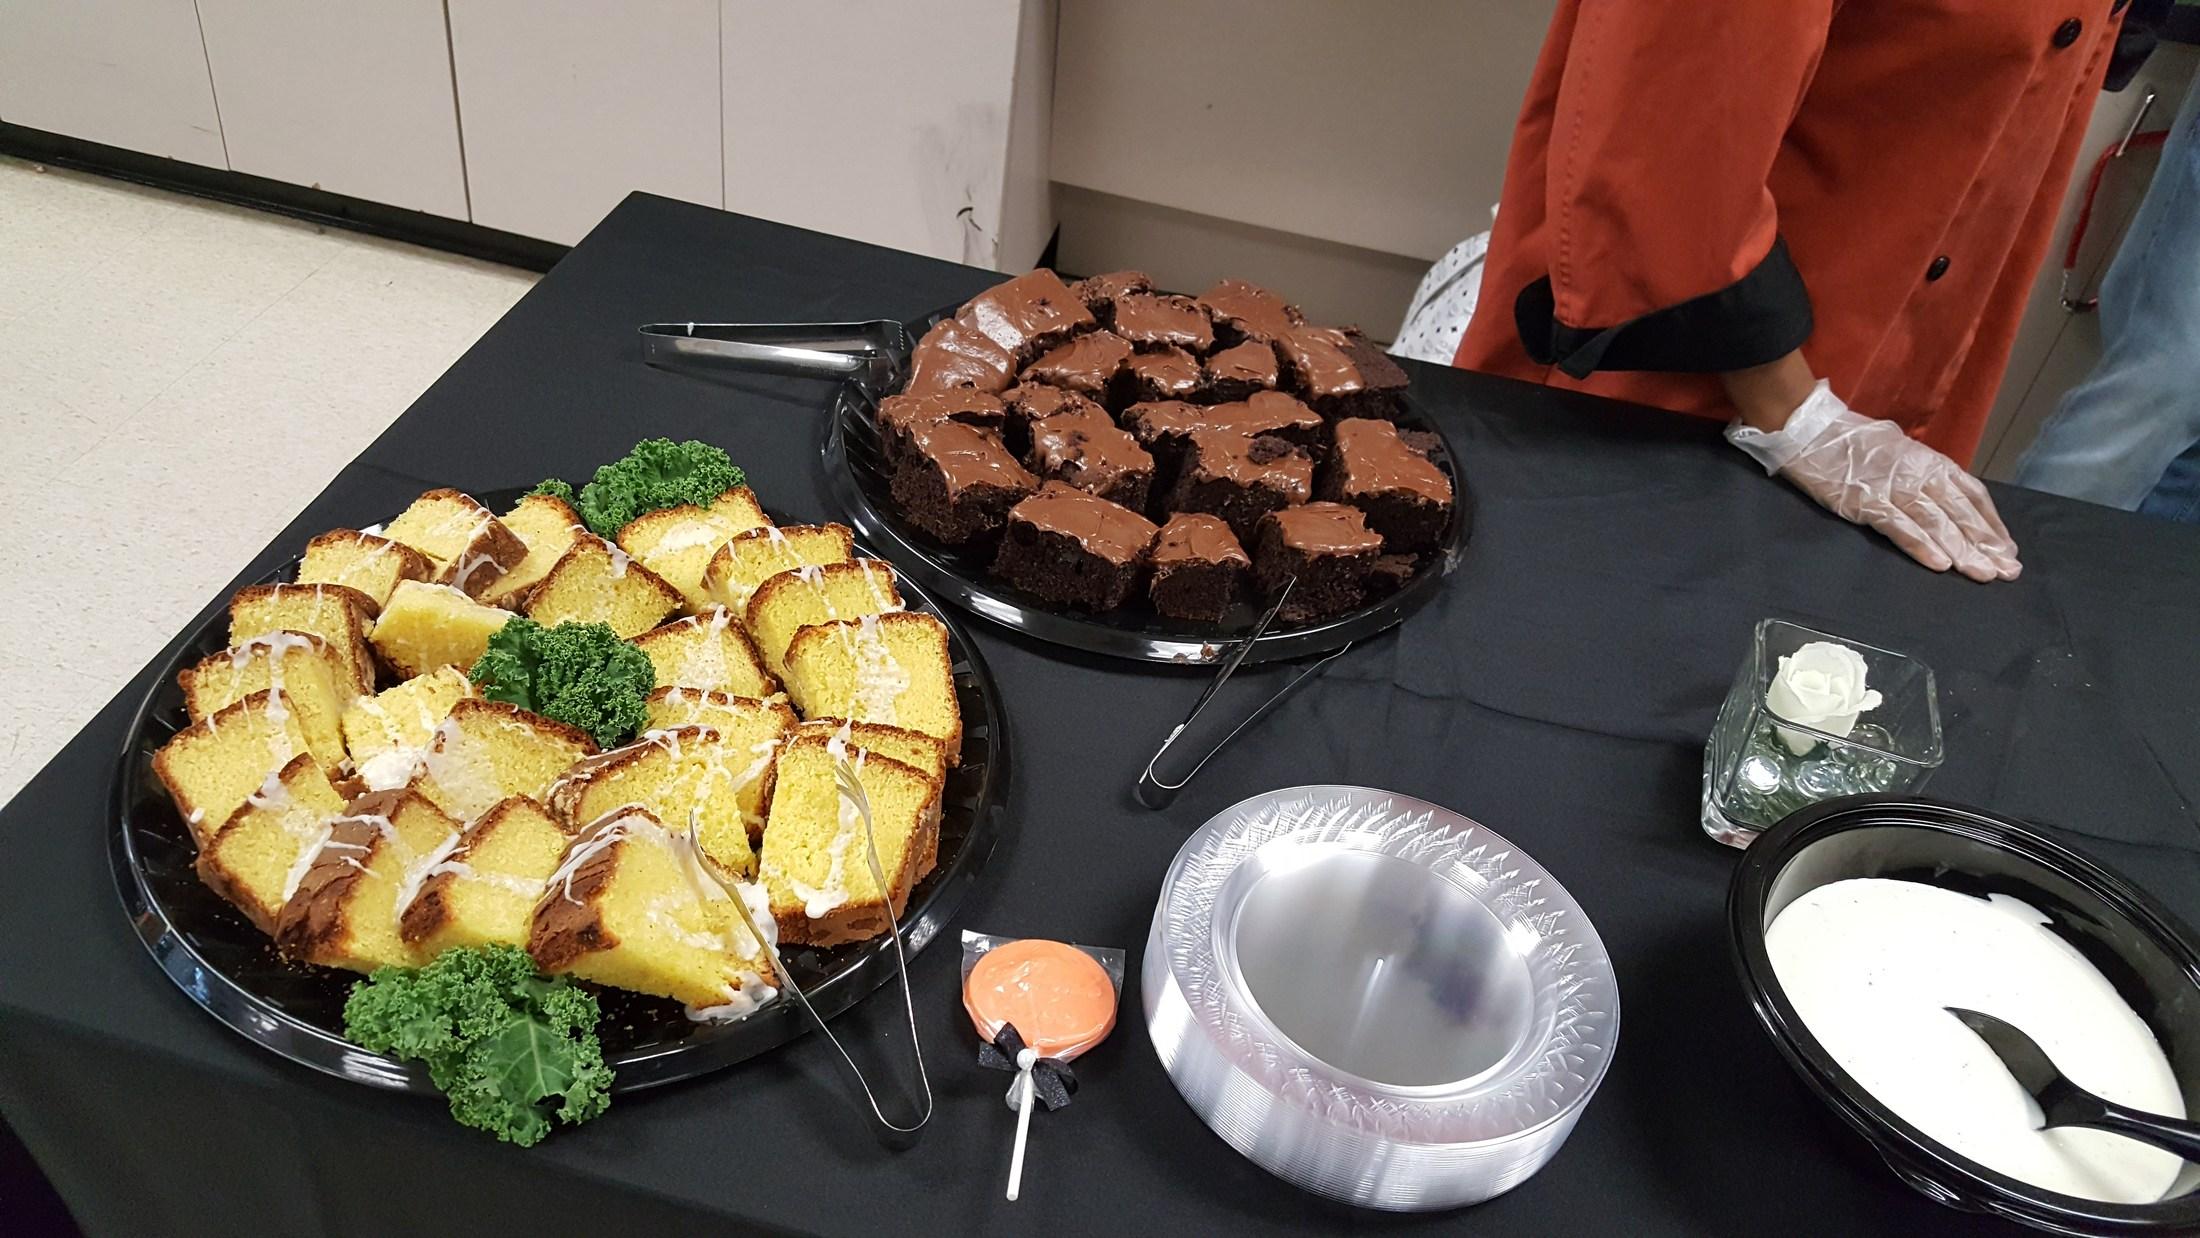 Culinary Arts Food